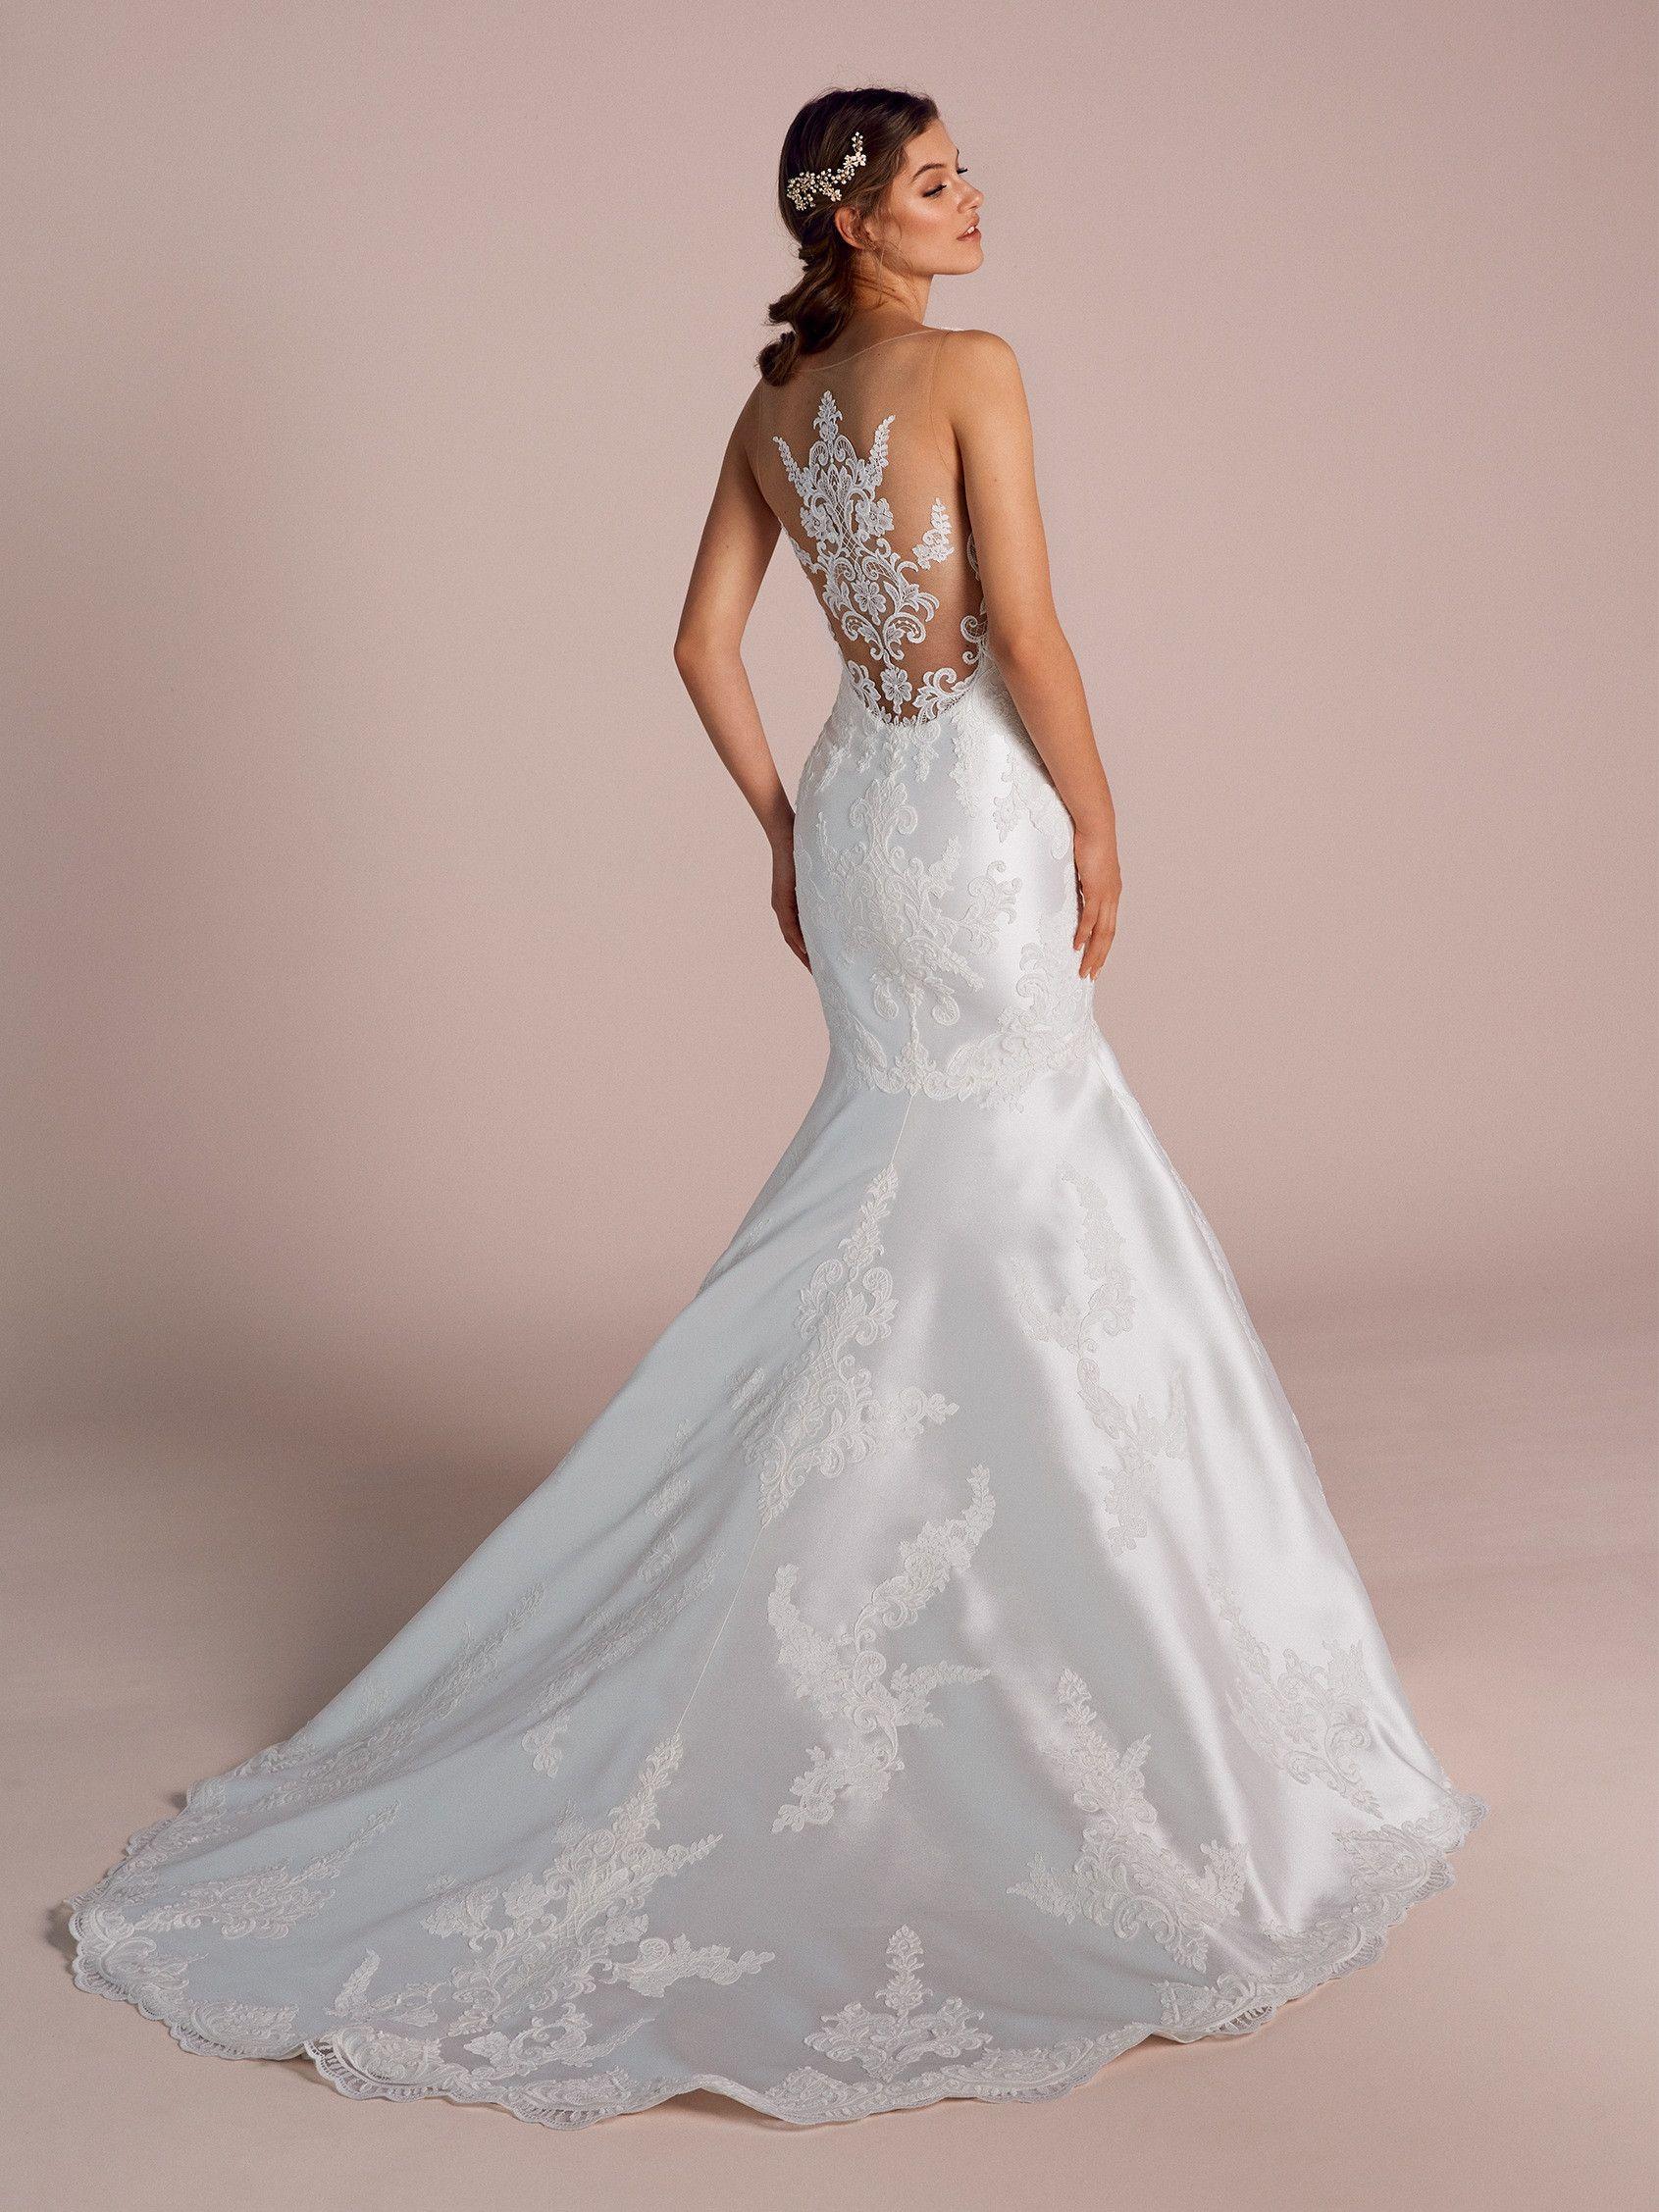 1f7601f43b18 Mermaid wedding dress with illusions and bateau neckline. Visit. March 2019